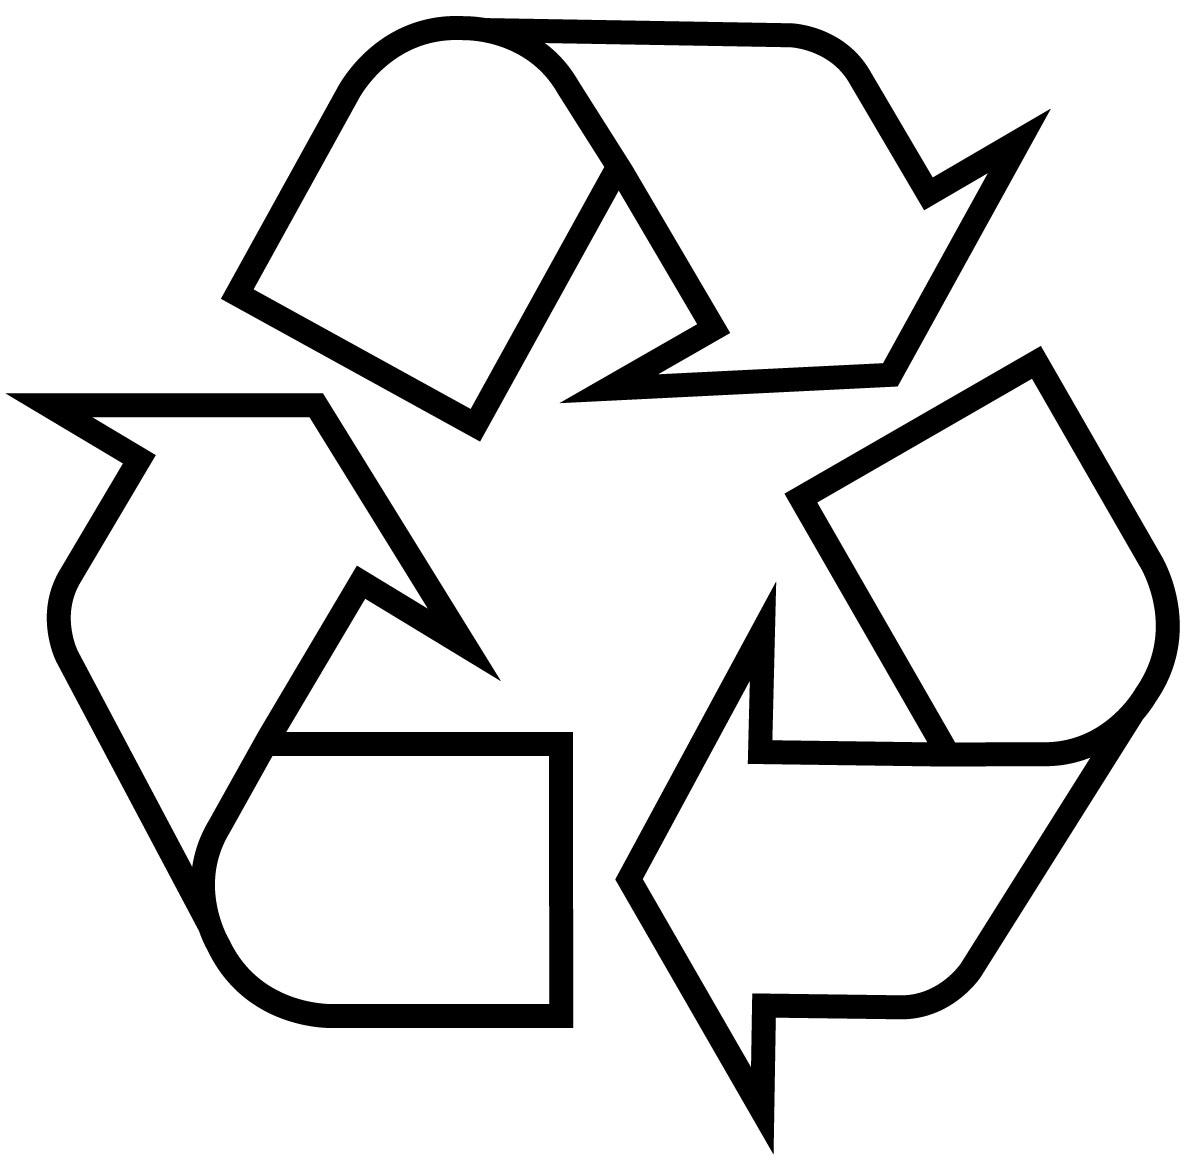 Using The Epa Seal And Logo